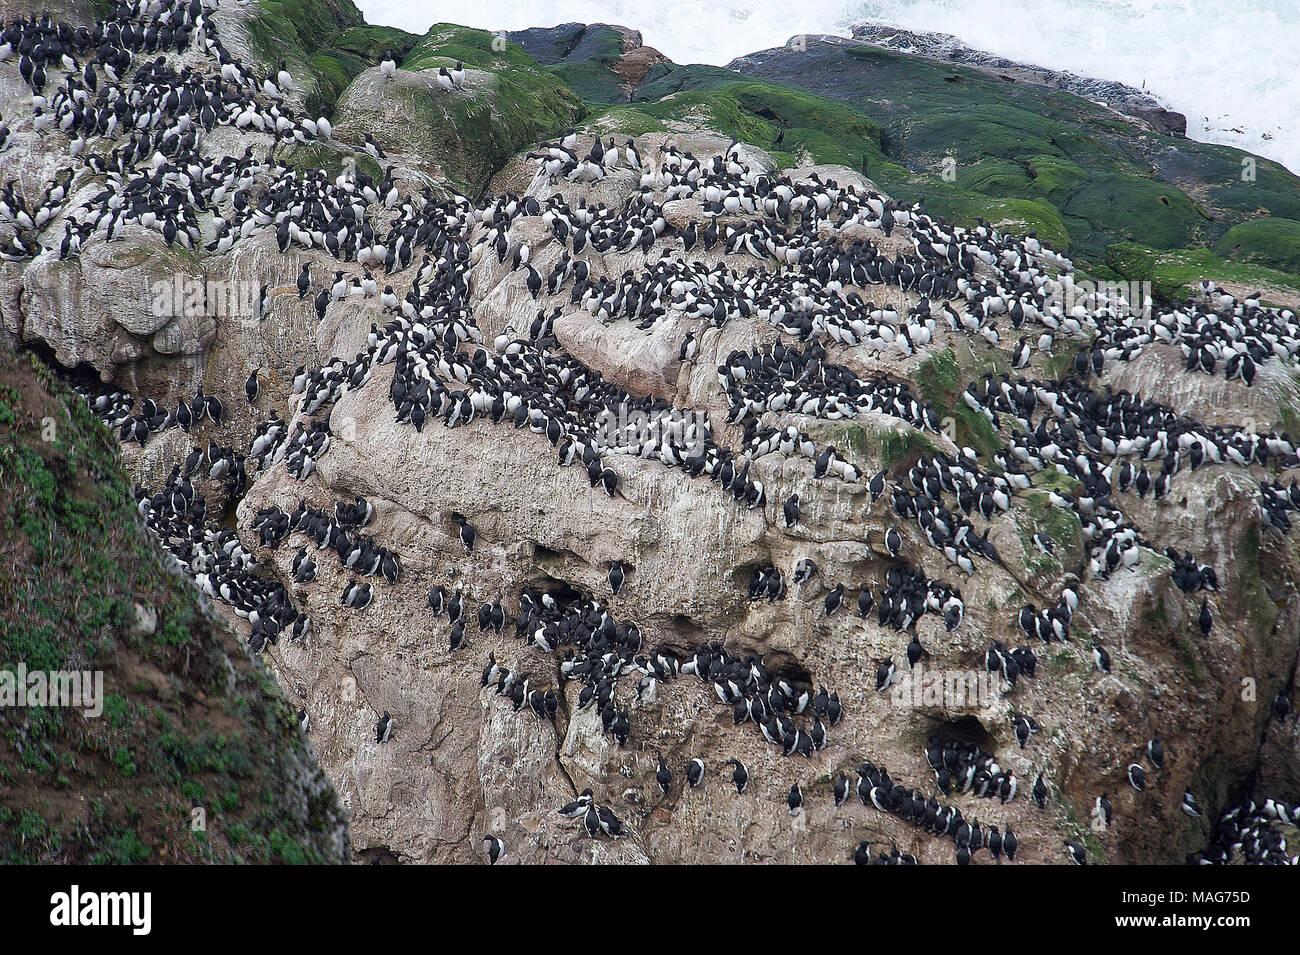 Common Murre (Uria aalge) gathered on rock,  Point Reyes National Seashore , California, USA - Stock Image